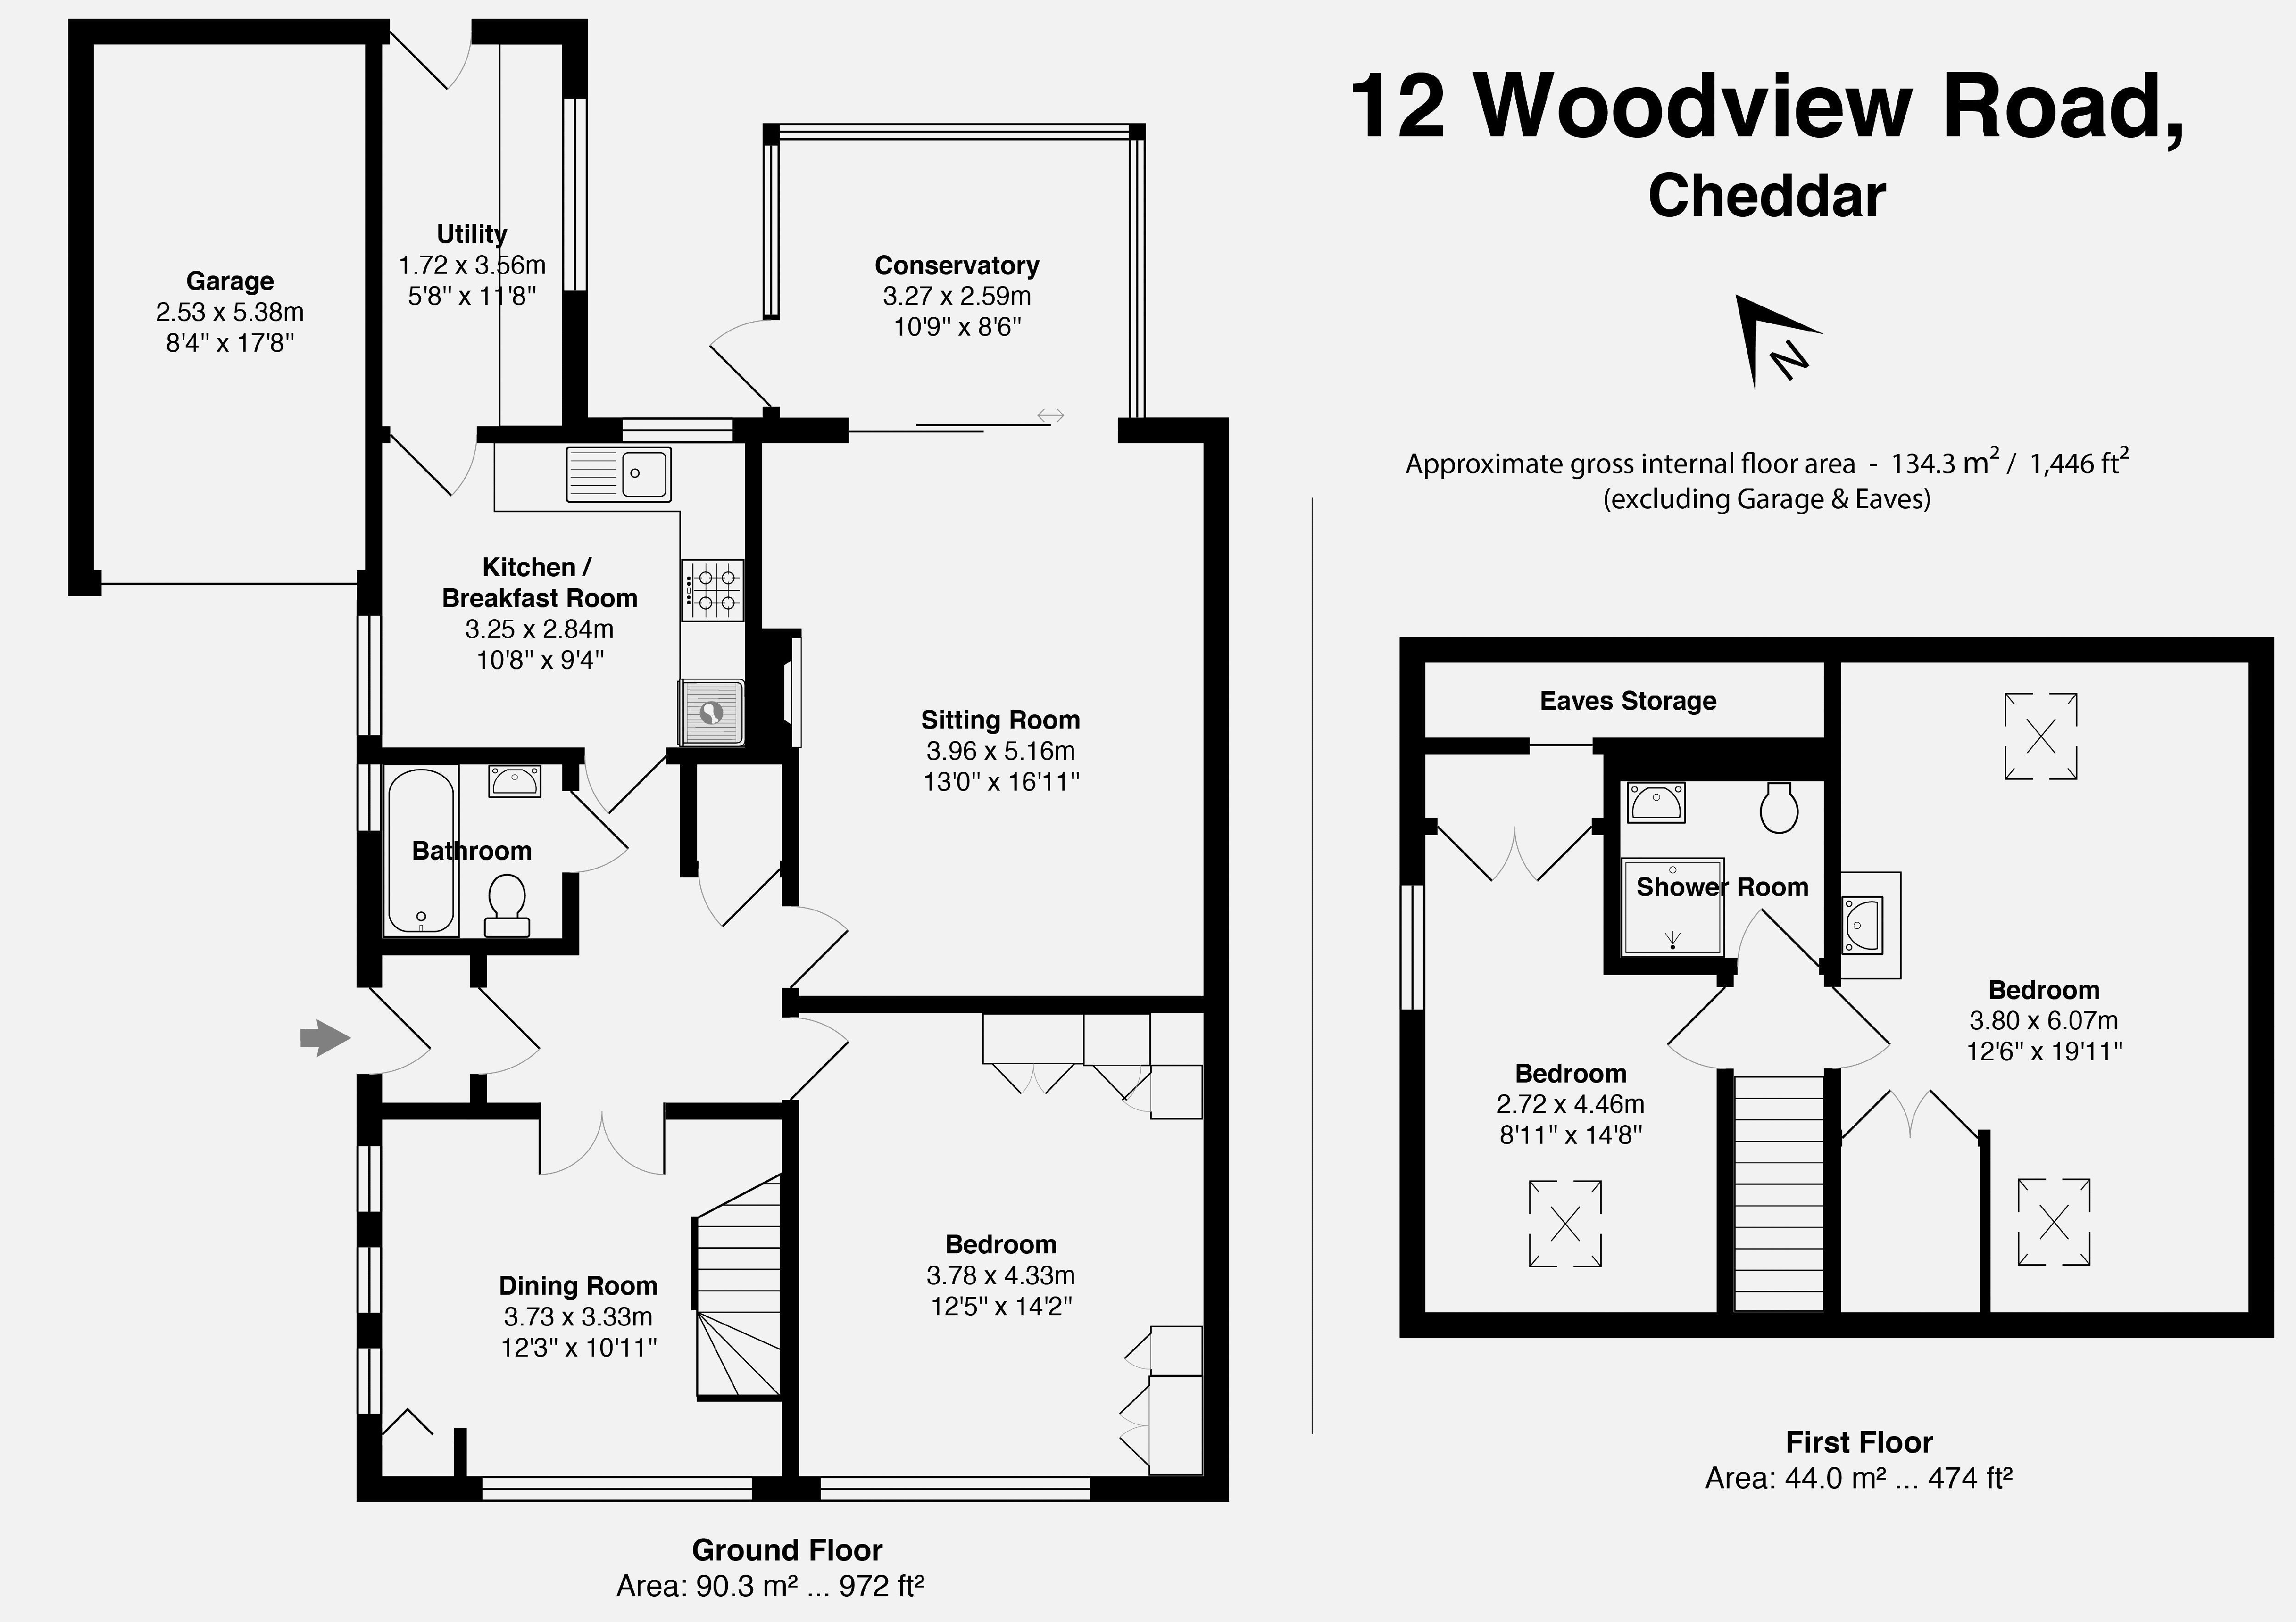 12 Woodview Road